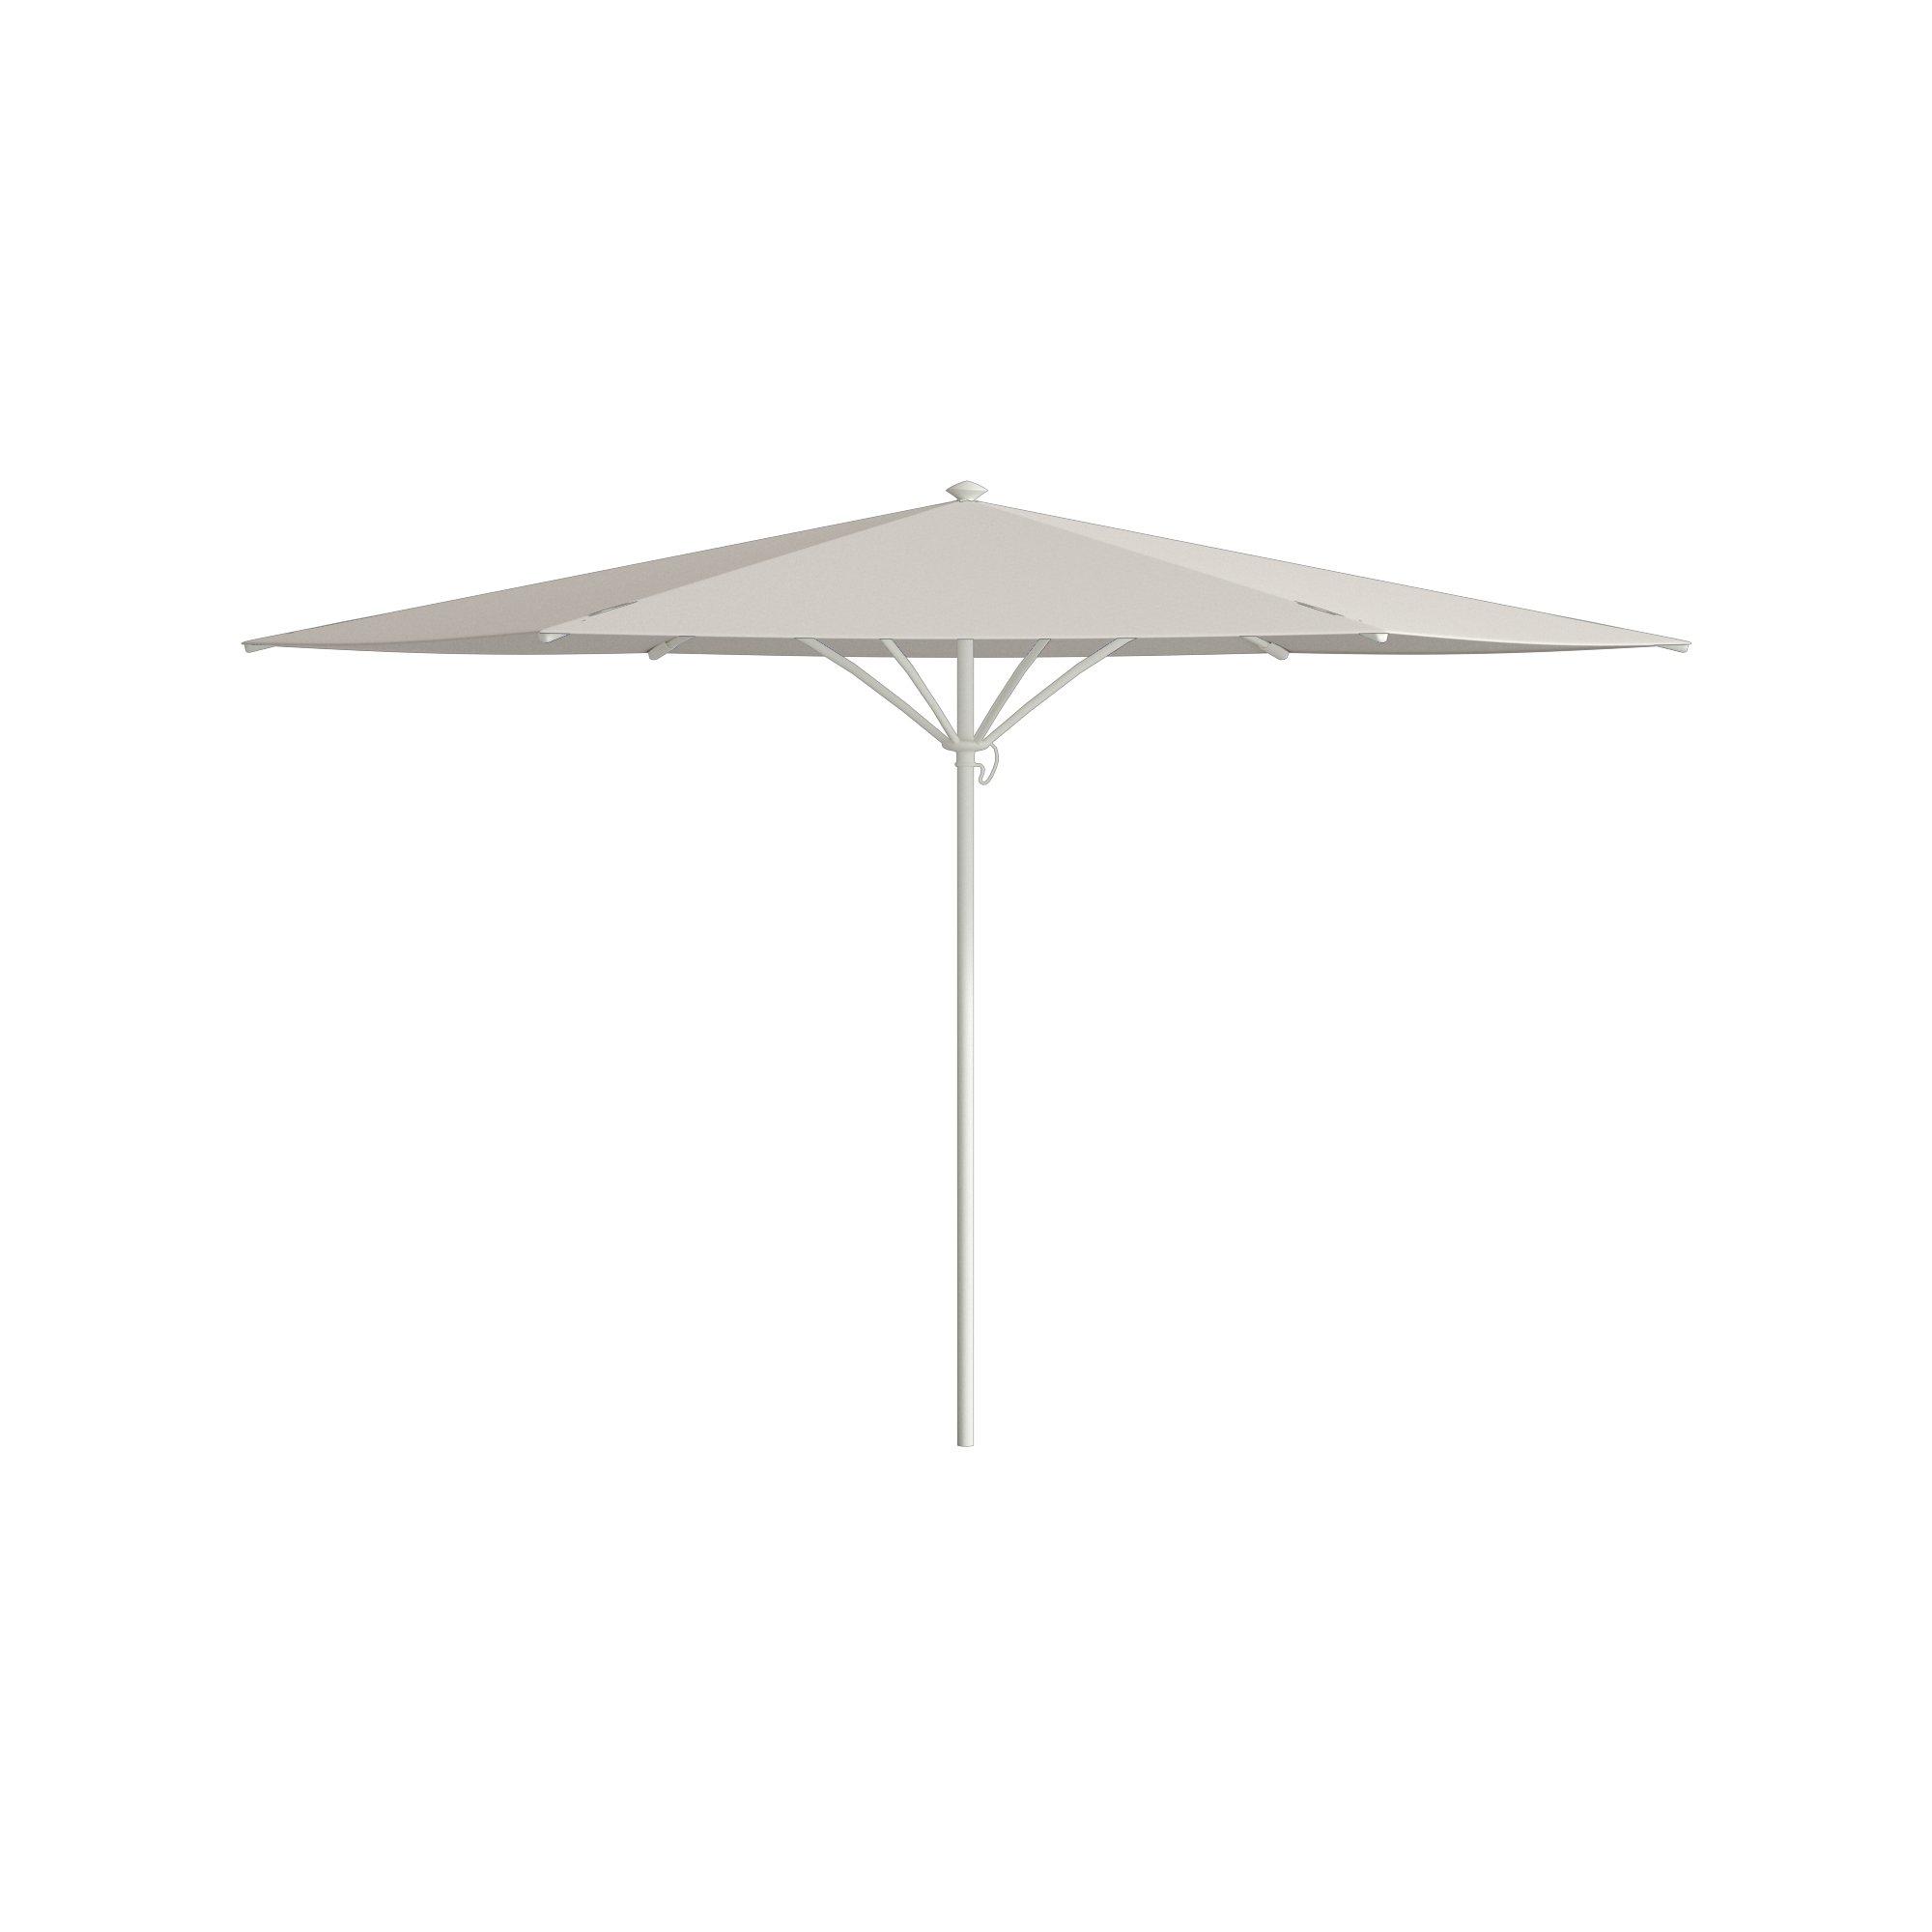 Favorite Trace 12' Market Umbrella Intended For Zeman Market Umbrellas (View 5 of 20)